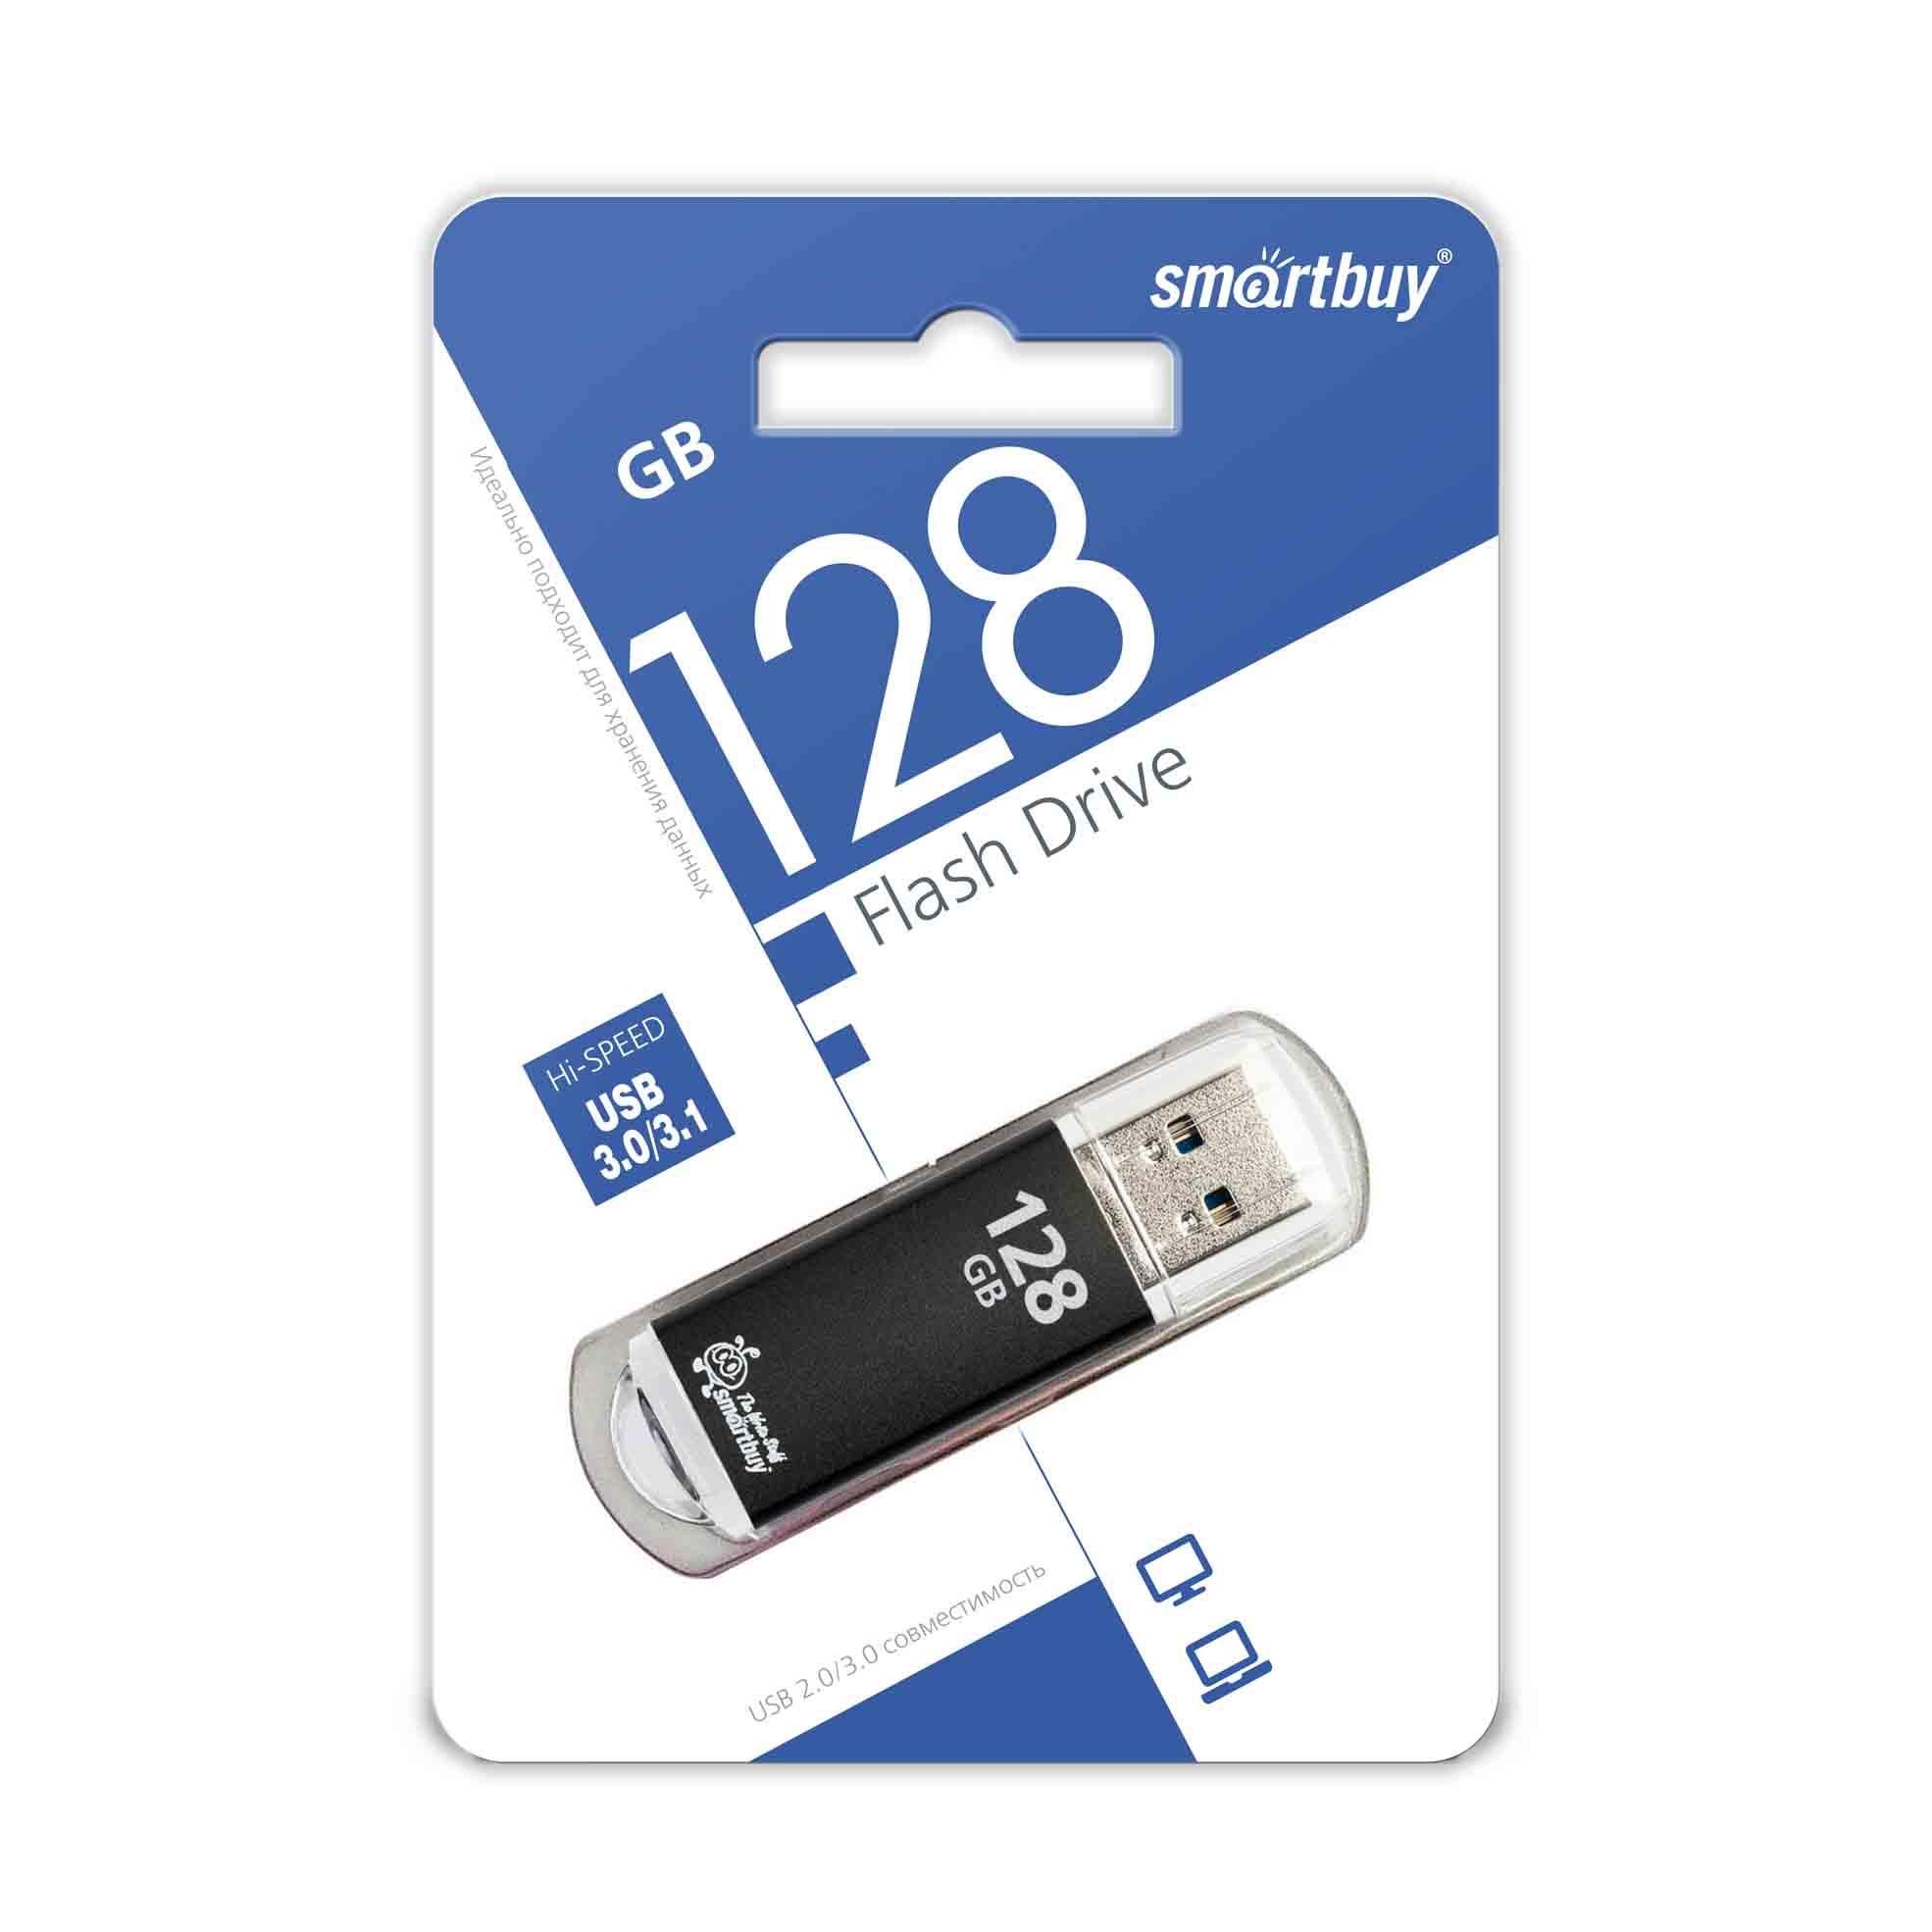 USB 3.0 флэш-диск Smartbuy V-Cut Black 128Gb оптом